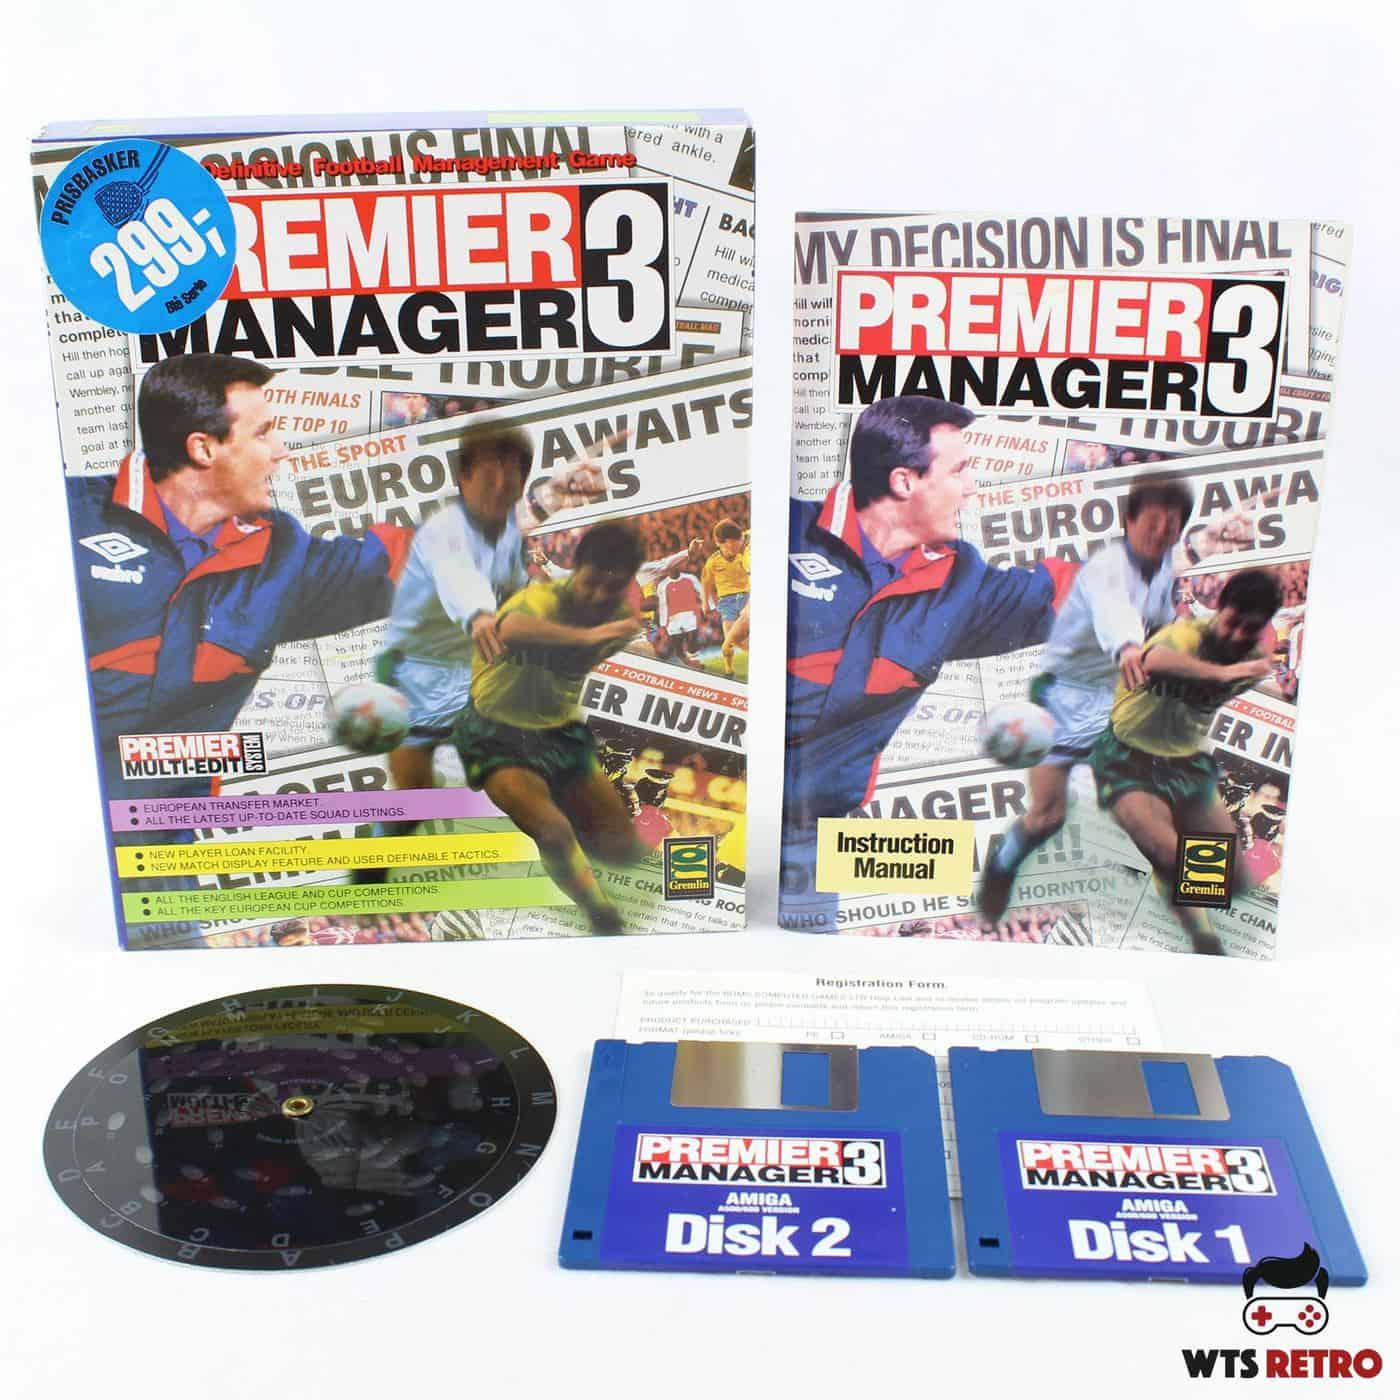 Premier Manager 3 (Amiga)